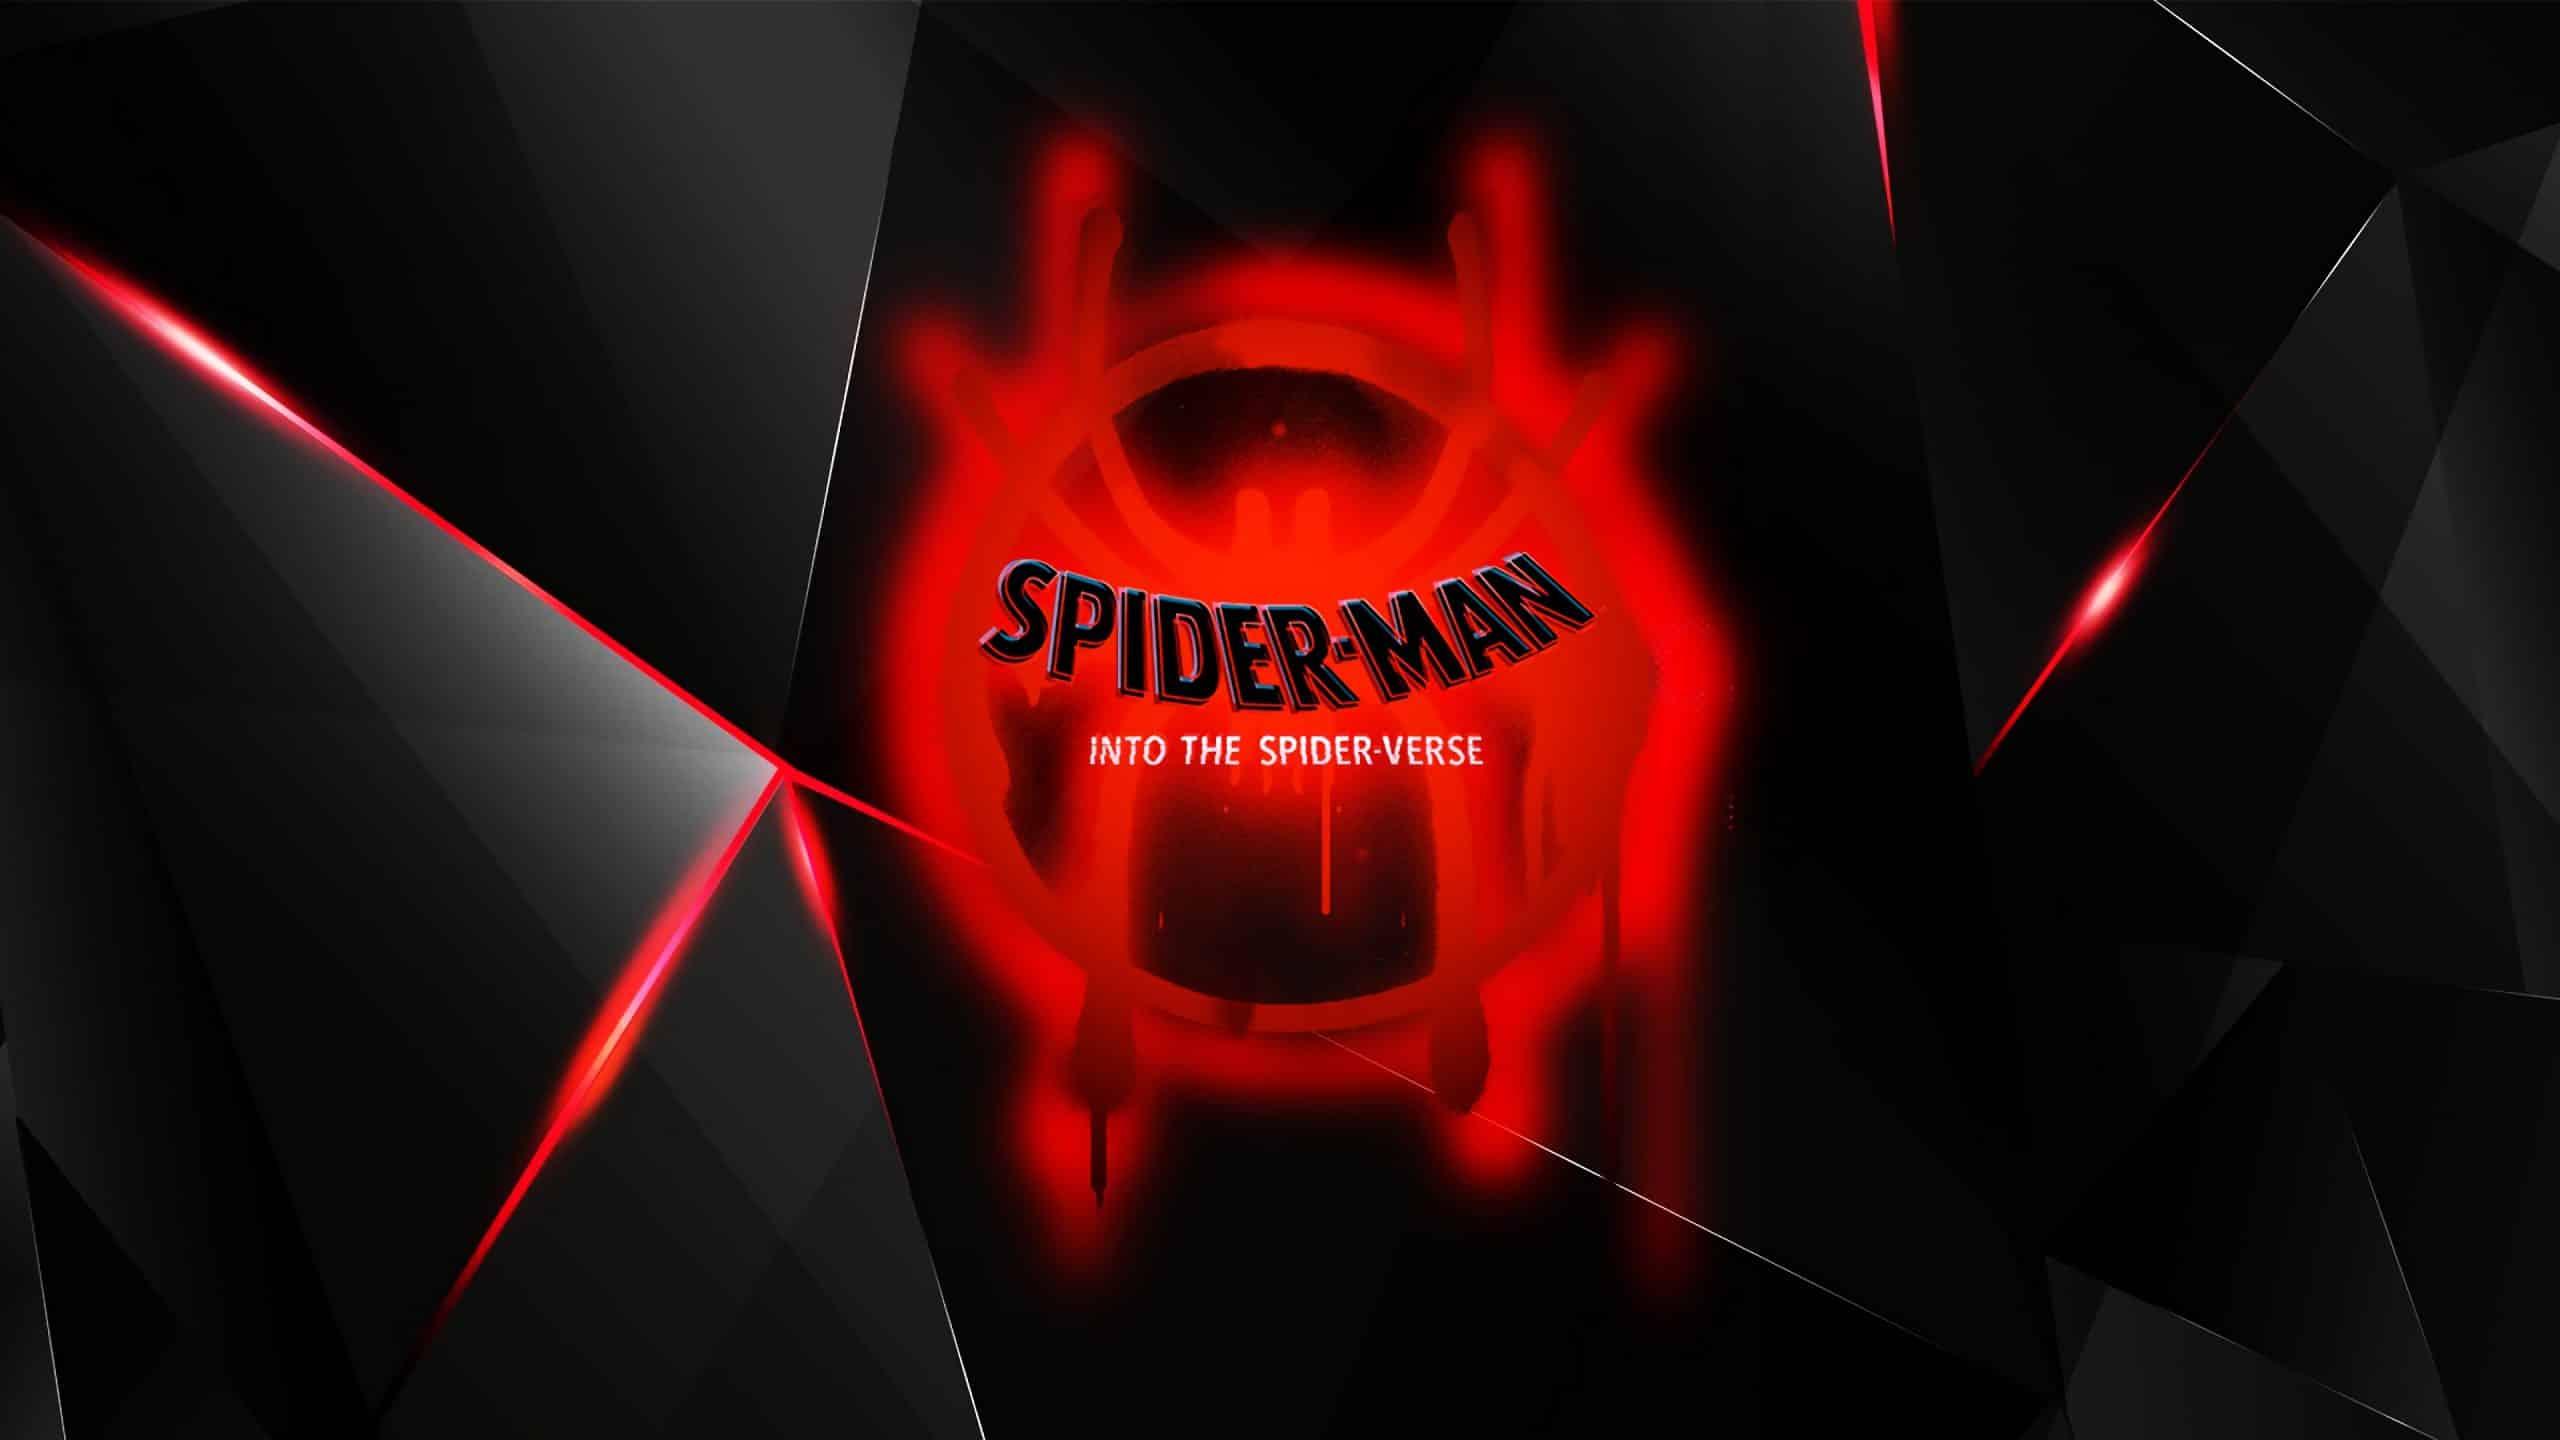 spider man into the spider verse in theatres december 14 2018